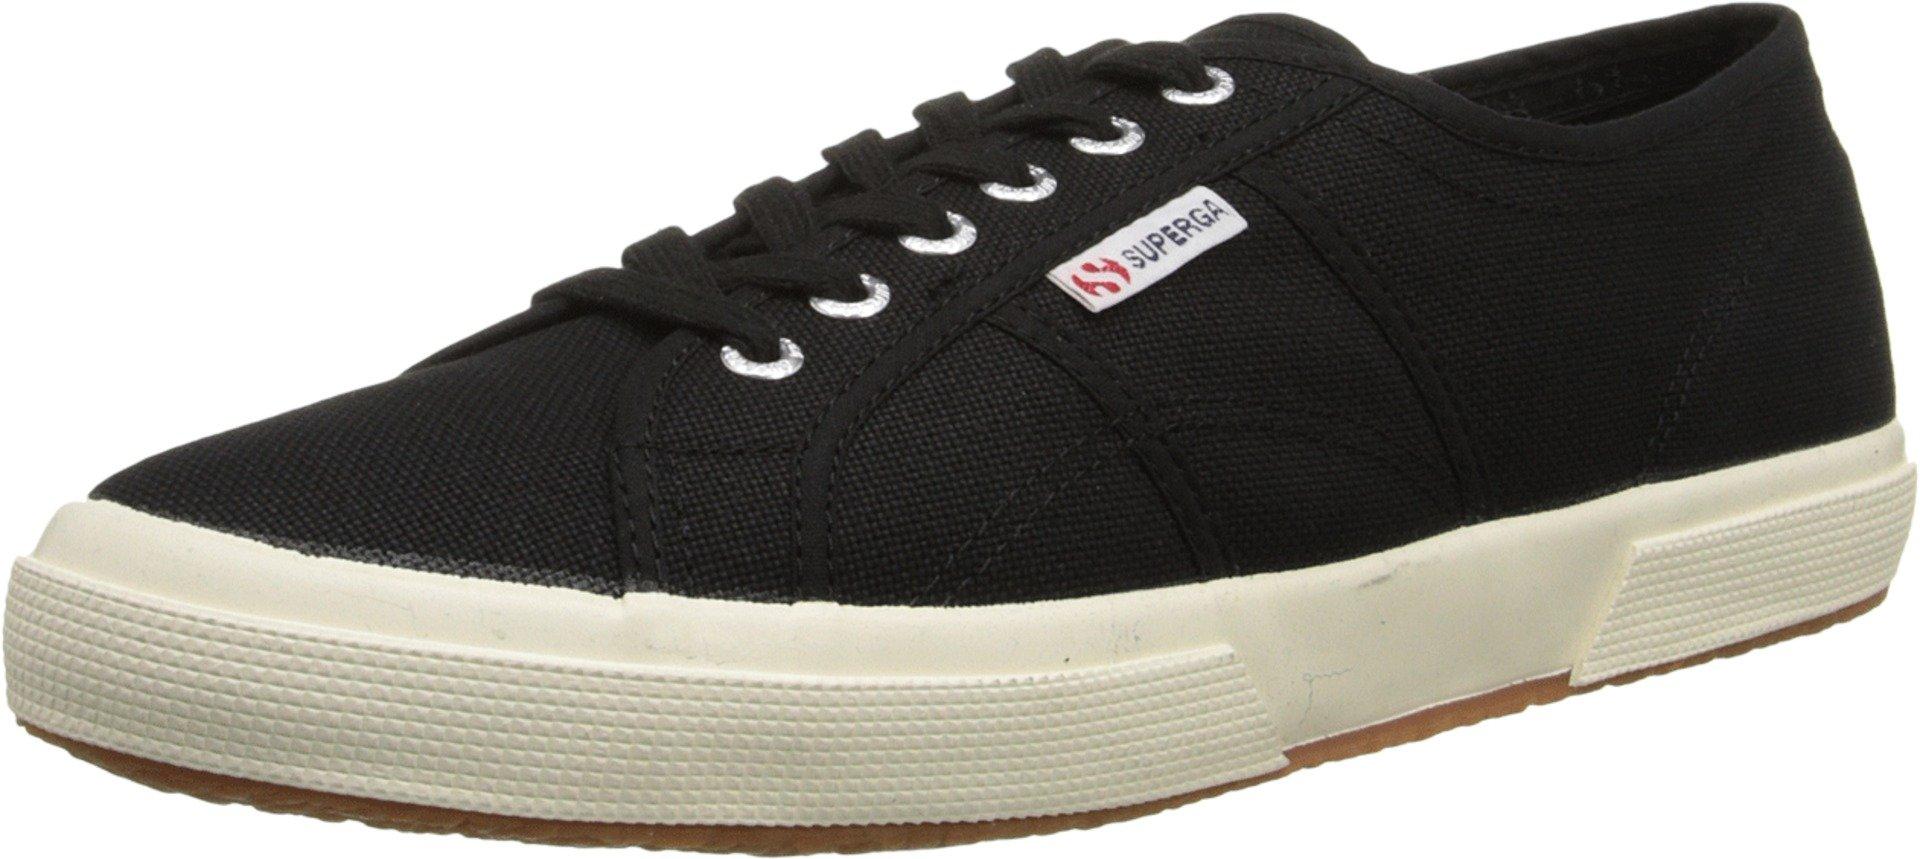 Superga Unisex 2750 Cotu  Black Classic Sneaker - 36 M EU / 6 B(M) US Women / 4.5 D(M) US Men